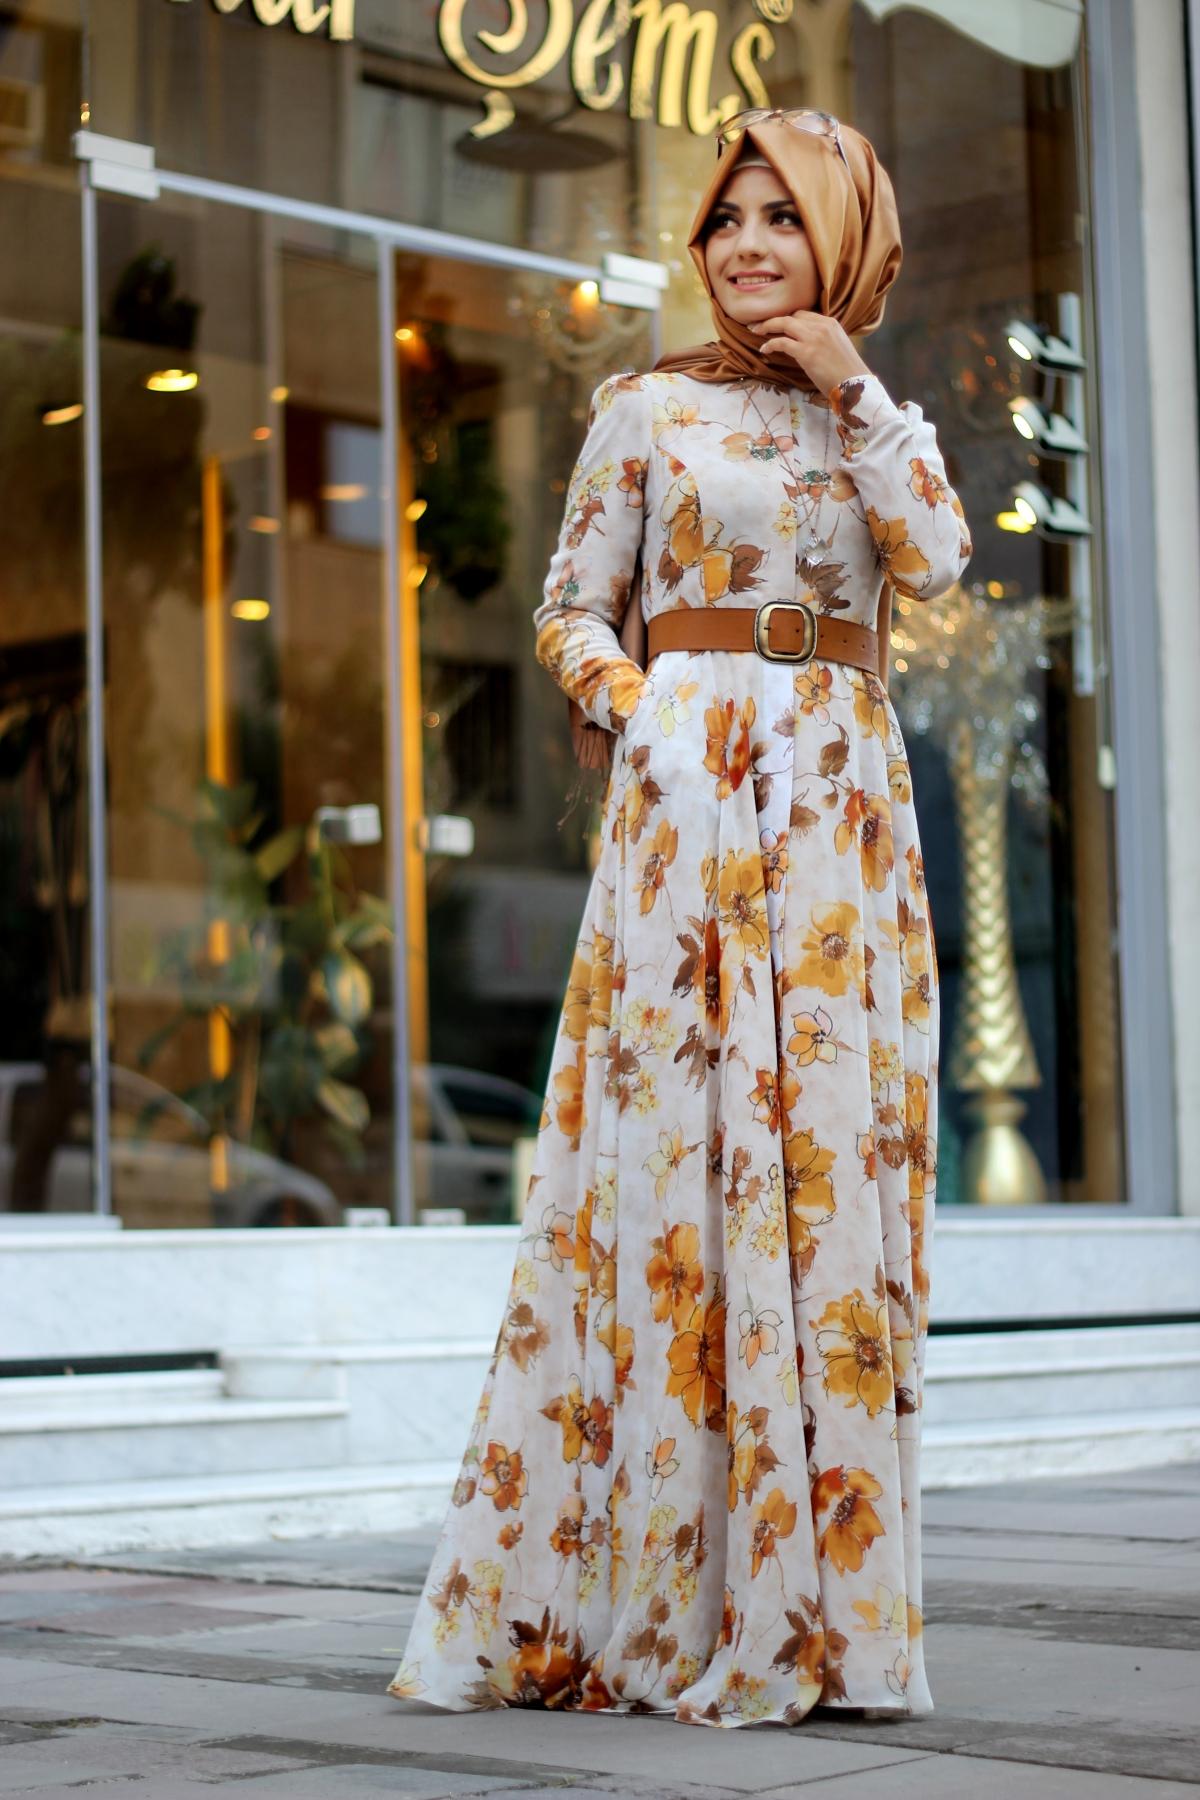 بالصور صور فساتين تركي , اجمل موديلات الفساتين التركي 1839 10